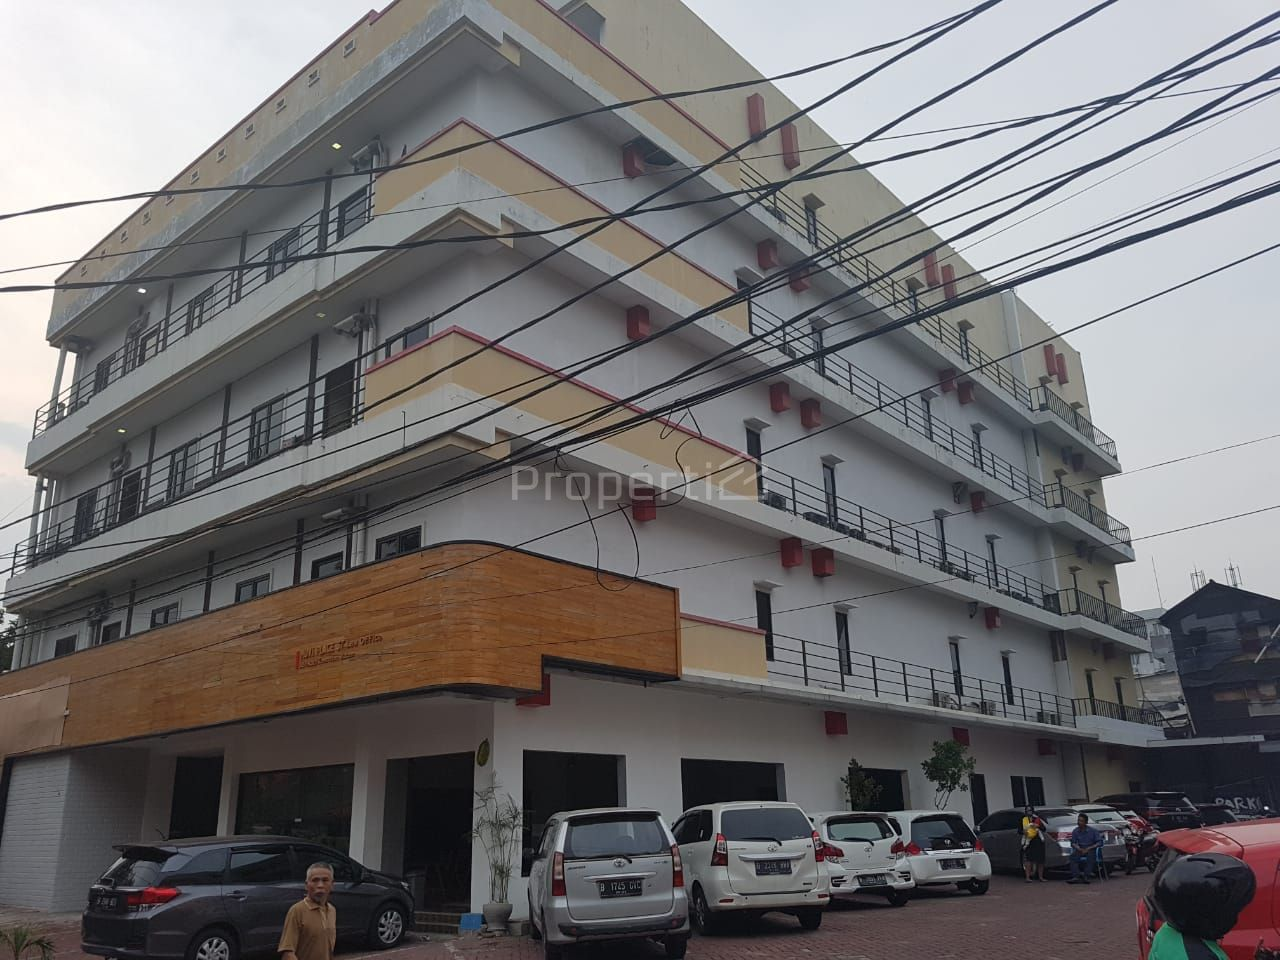 Rumah Kost dengan 100 Kamar di Mangga Besar, DKI Jakarta